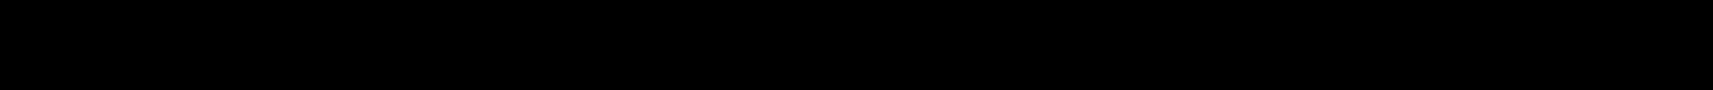 {\displaystyle \sum _{k=0}^{1}{{\binom {n}{k}}\left({\frac {d^{k}}{dx^{k}}}f(x)\right)\left({\frac {d^{n-k}}{dx^{n-k}}}g(x)\right)}={\binom {1}{0}}\left({\frac {d^{0}}{dx^{0}}}f(x)\right)\left({\frac {d^{1}}{dx^{1}}}g(x)\right)+{\binom {1}{1}}\left({\frac {d^{1}}{dx^{1}}}f(x)\right)\left({\frac {d^{0}}{dx^{0}}}g(x)\right)=\left(f(x)\right)\left({\frac {d}{dx}}g(x)\right)+\left({\frac {d}{dx}}f(x)\right)\left(g(x)\right)}